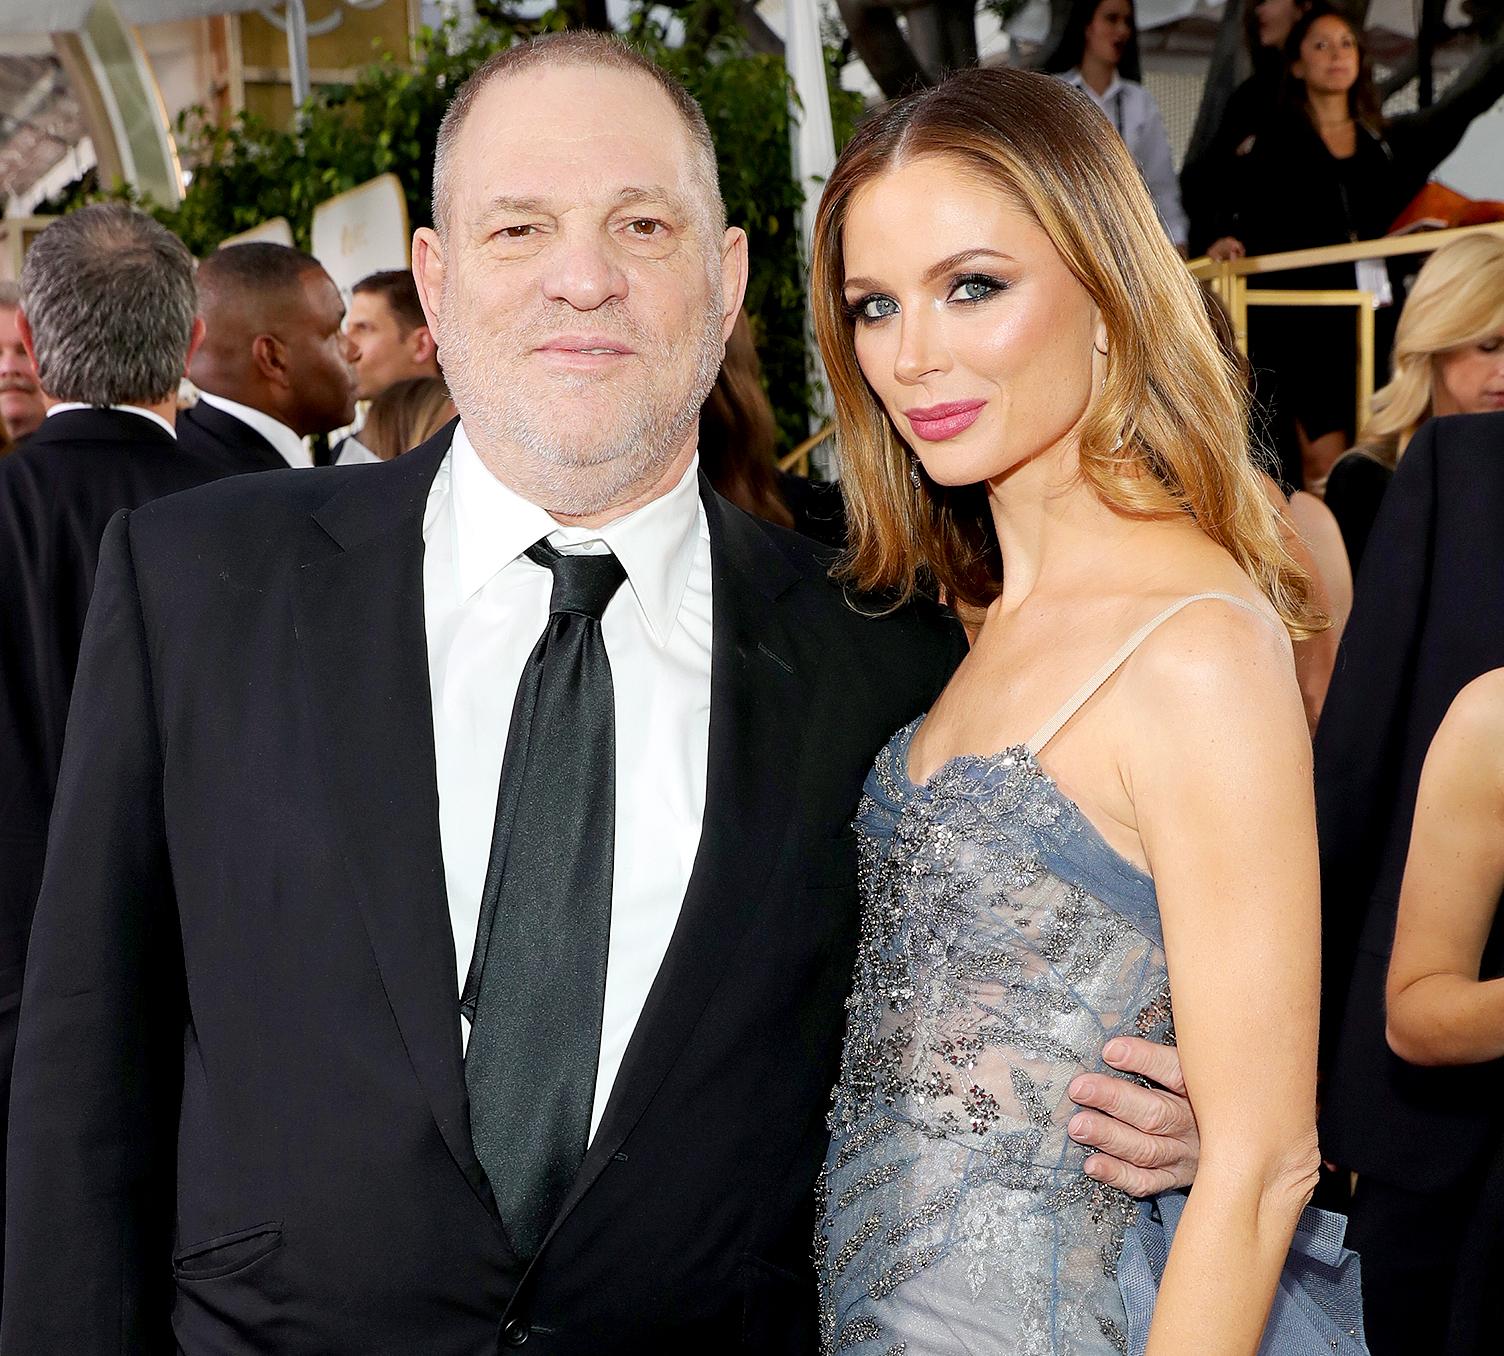 Harvey Weinstein settles mega-million divorce with British ex Georgina Chapman